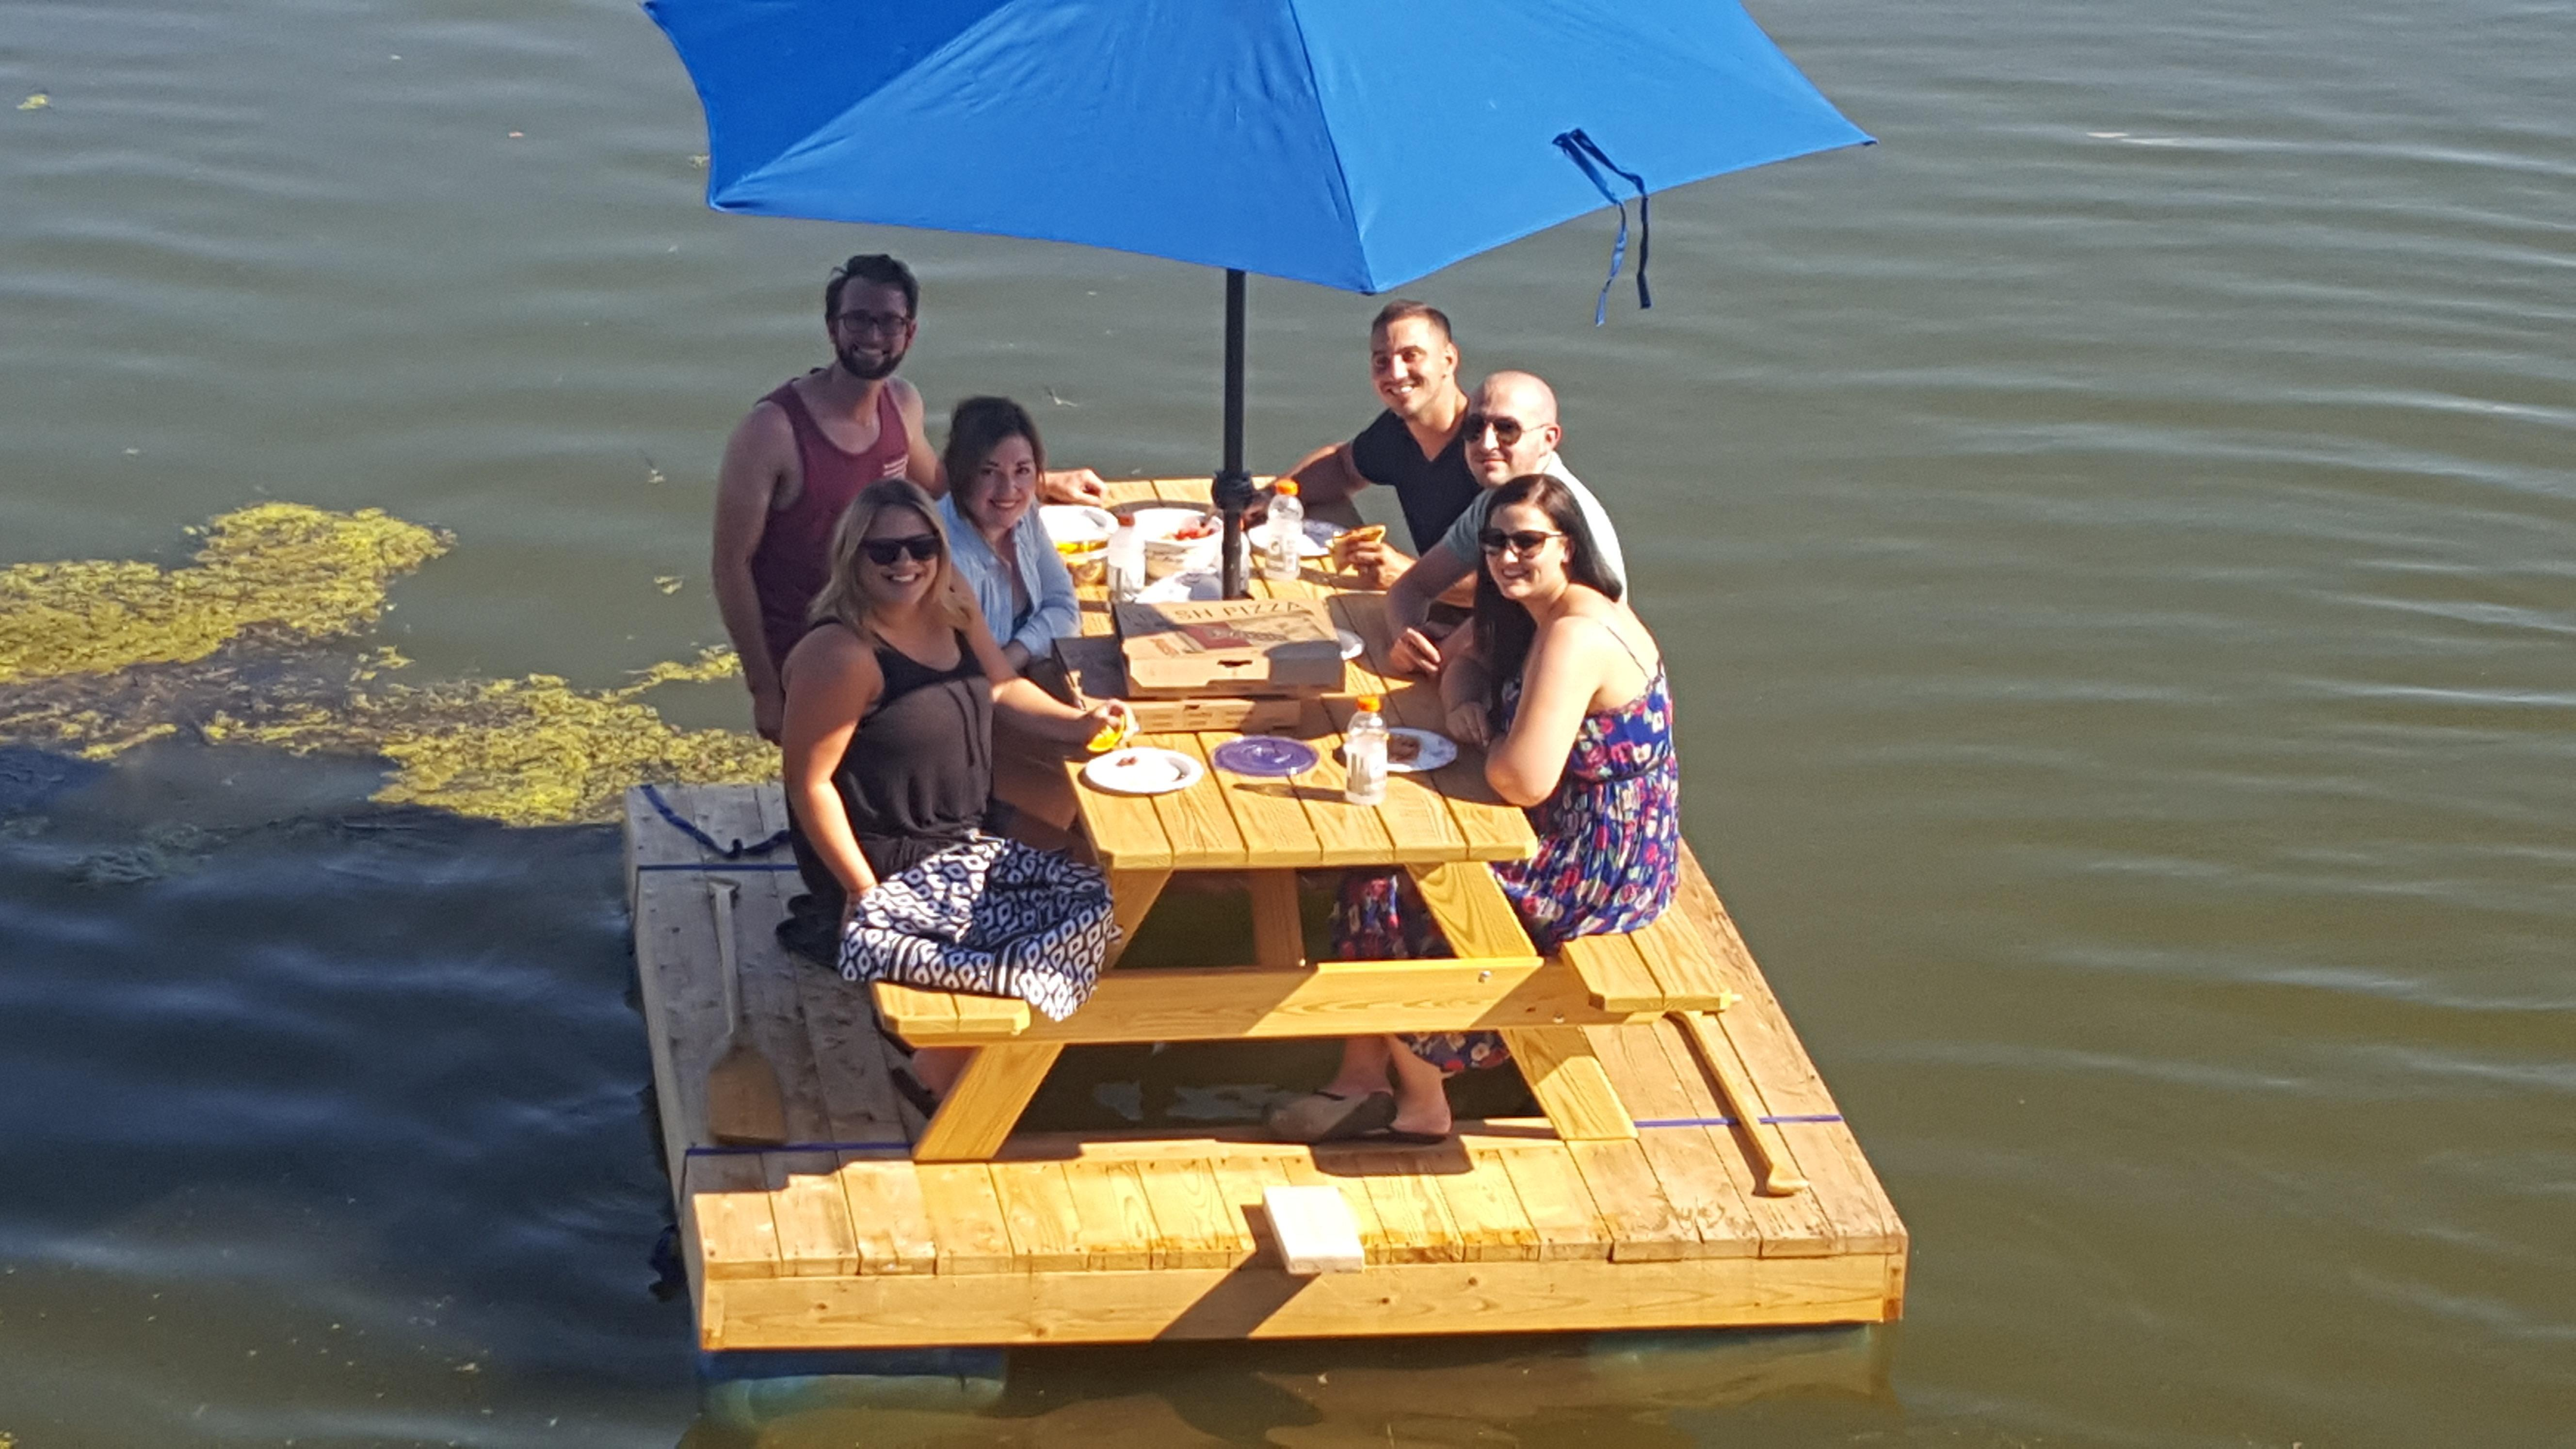 Lancaster County Couple Creates Picnic Boat Washington Times - Picnic table raft